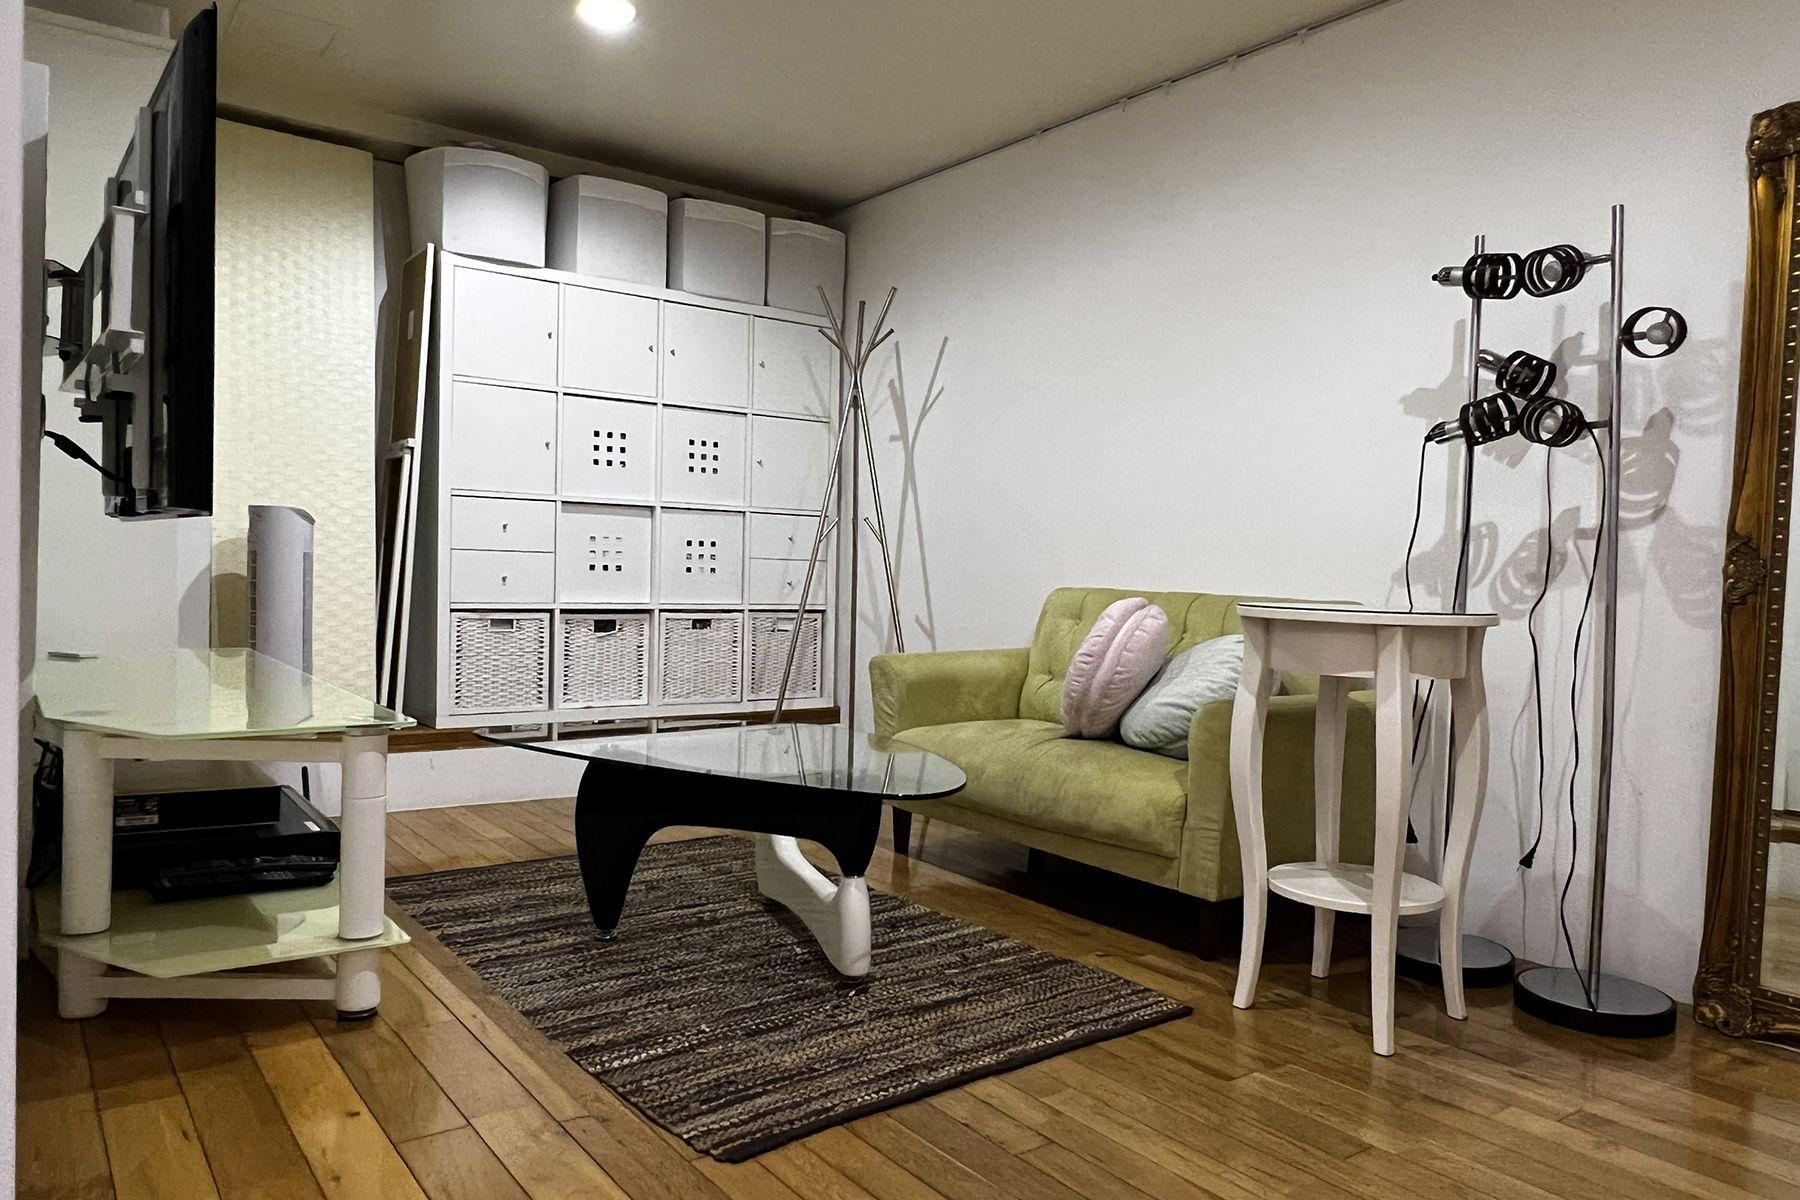 tasstudio(タススタジオ)スタジオ家具・小物類